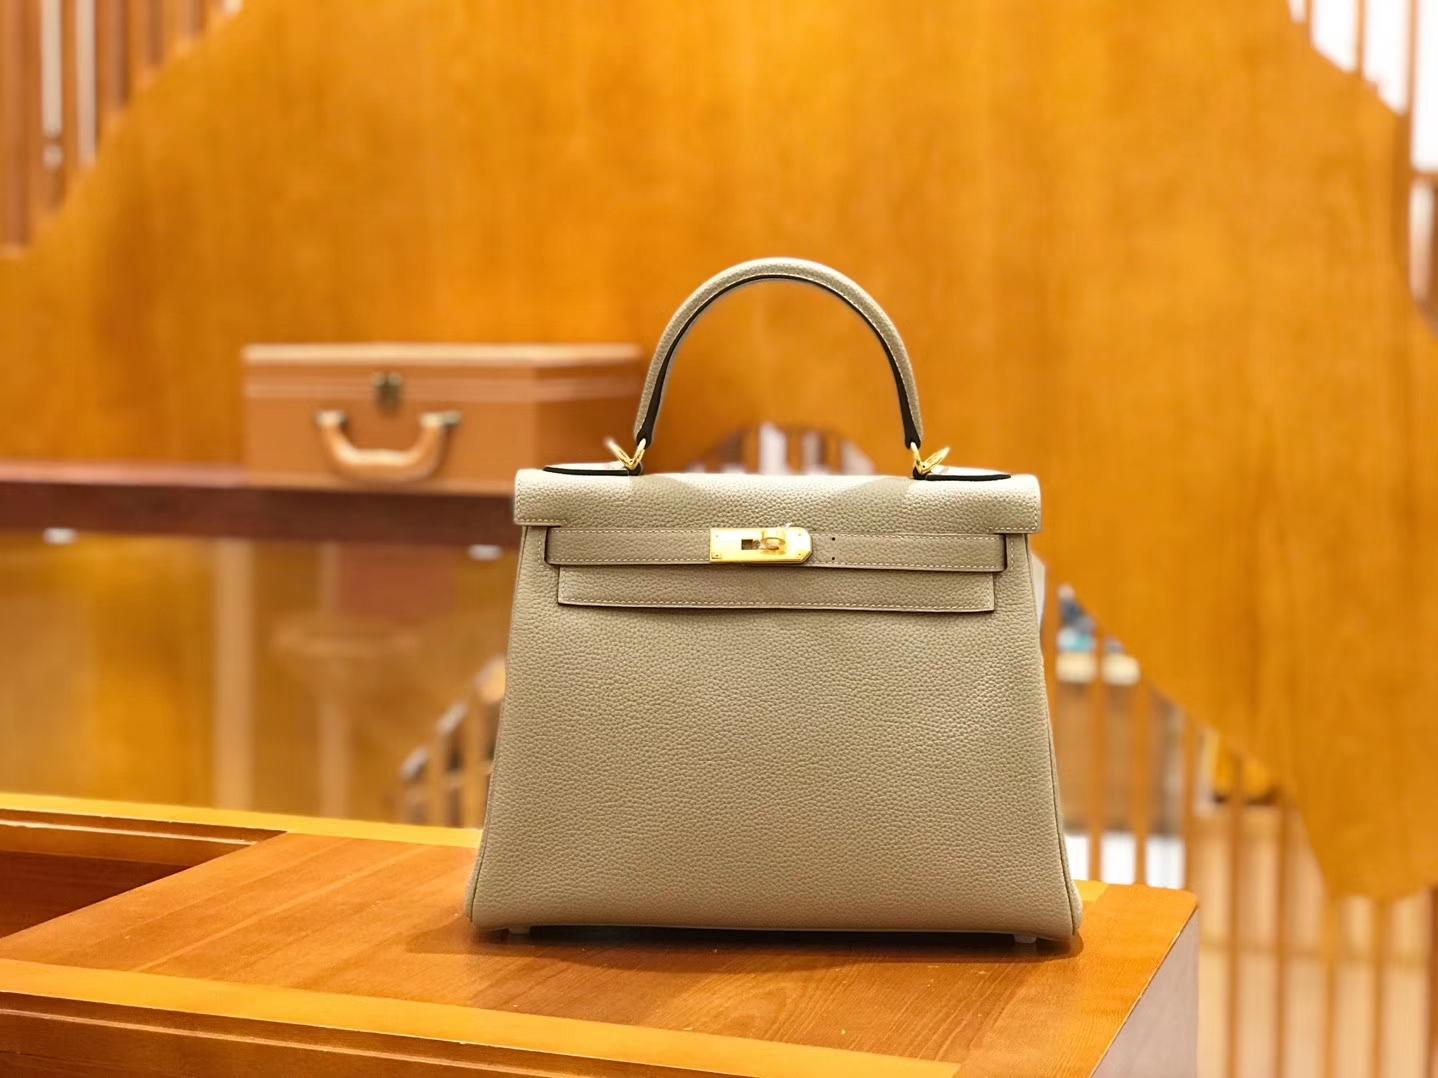 Hermès(爱马仕)Kelly 28cm togo 牛皮 斑鸠灰 金扣 全手工缝制 现货